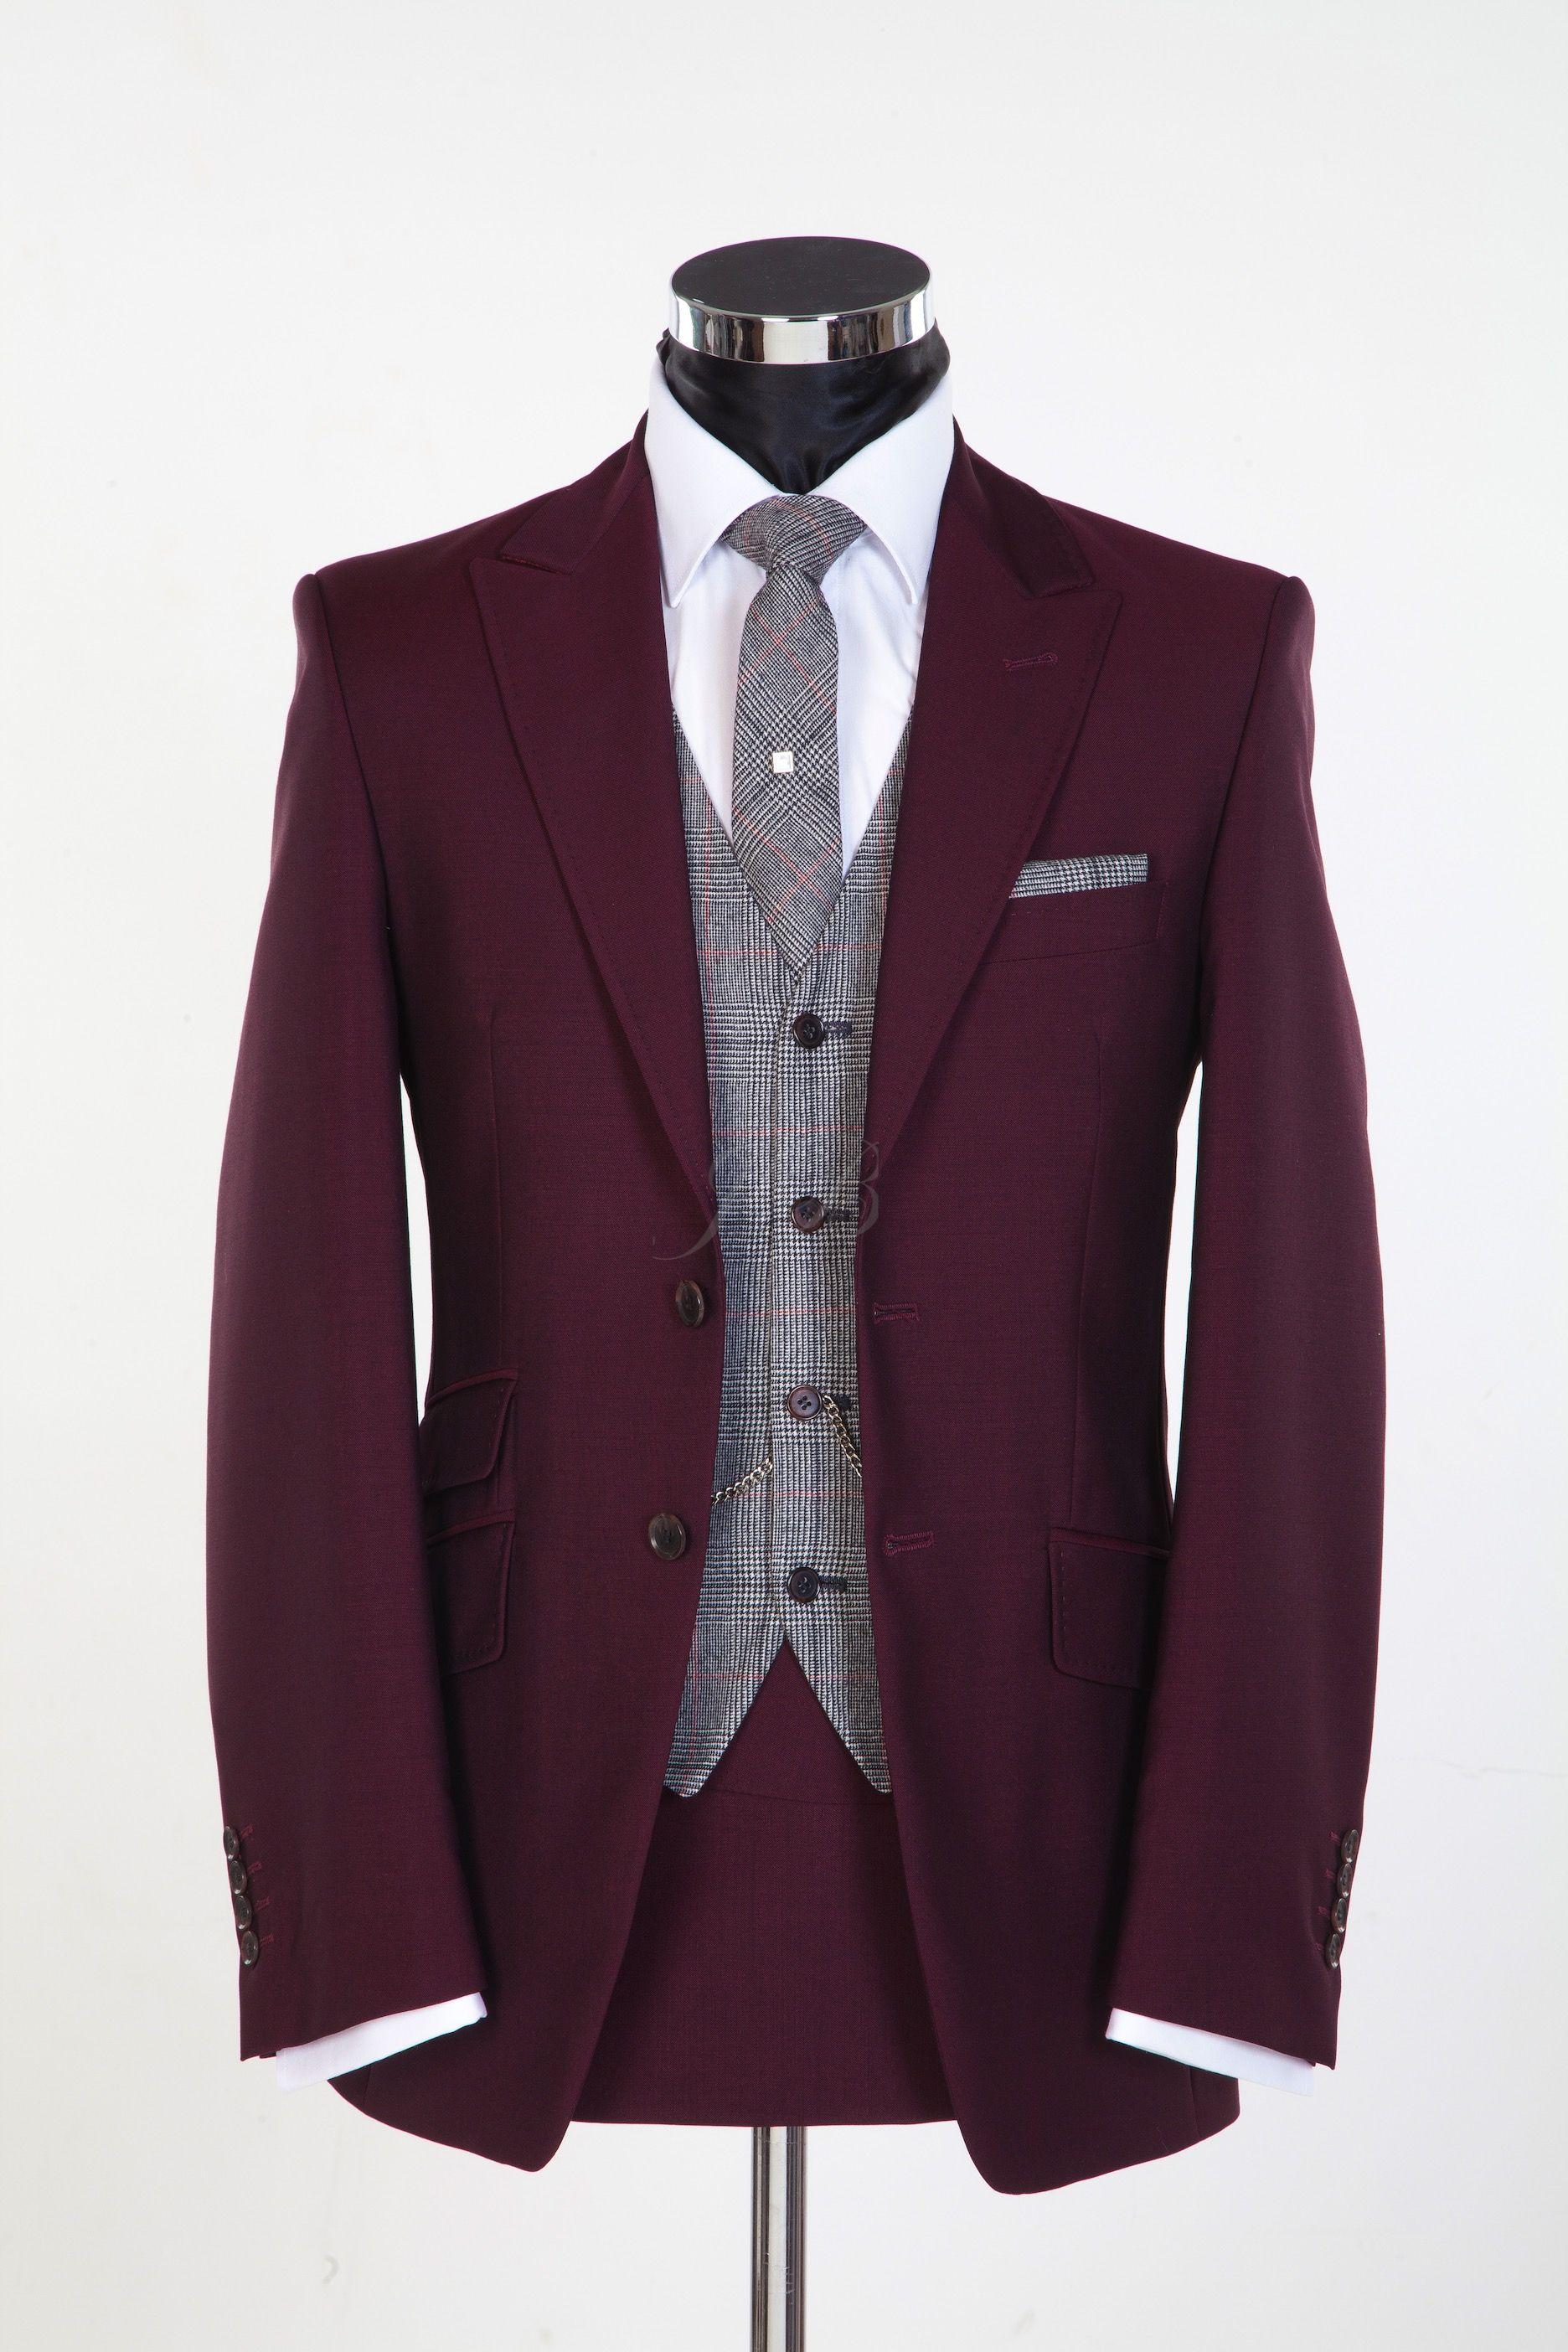 c34f99854278 burgundy vintage style wedding suit   ERKEK MODASI   Burgundy suit ...